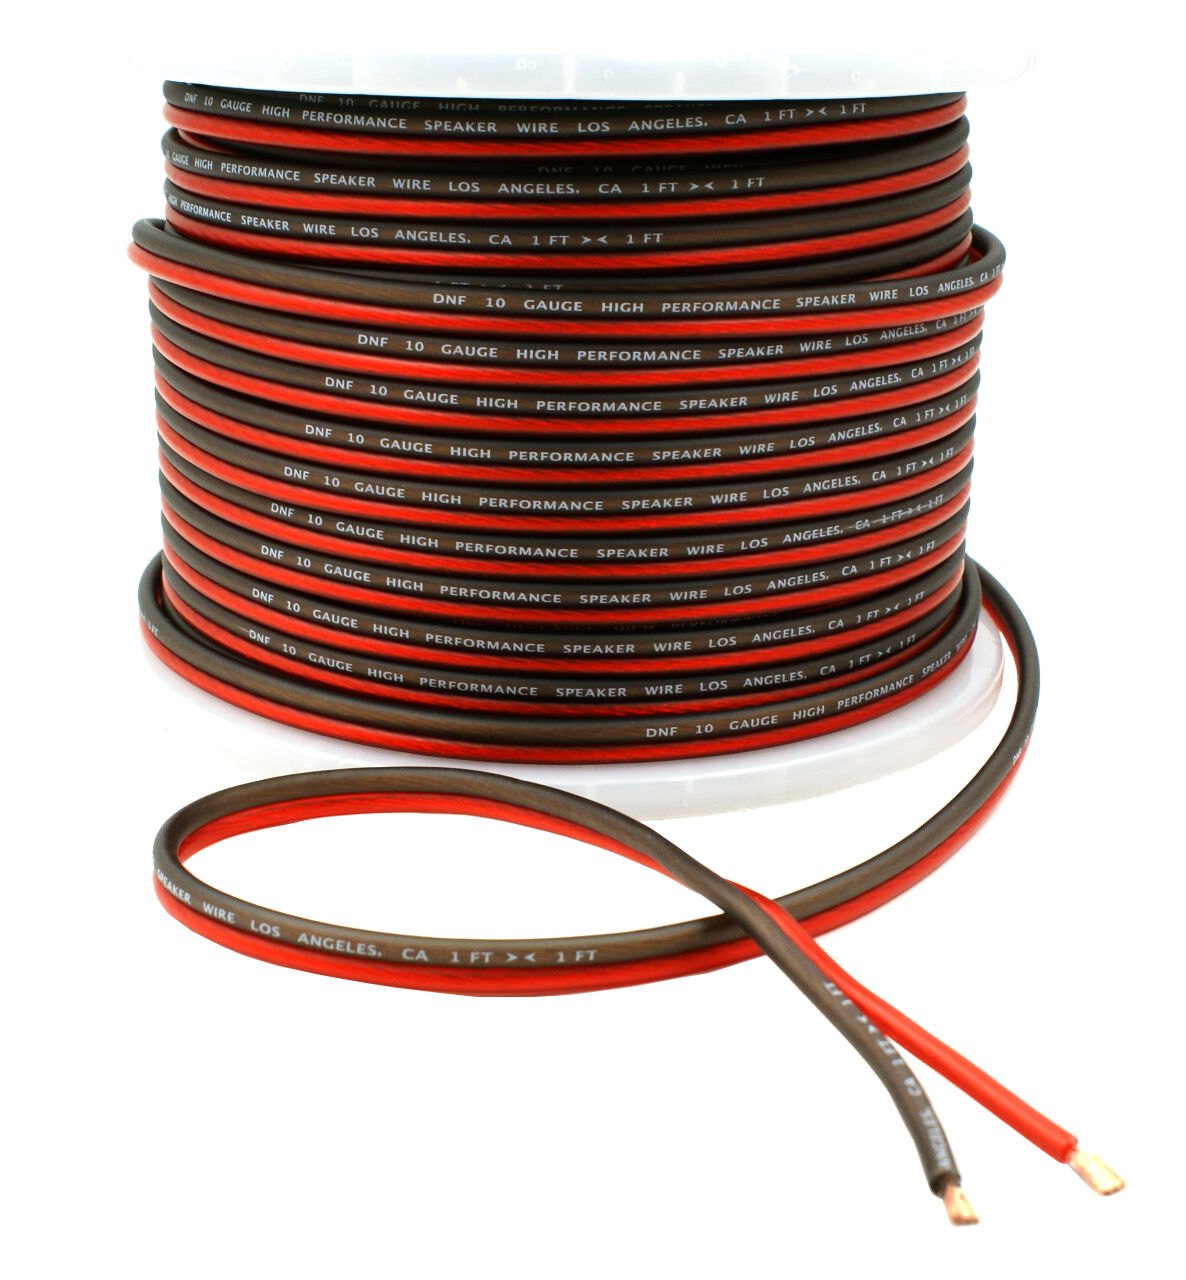 DNF Car Audio Home Speaker Wire 10 Gauge 250 Feet Audio Spea